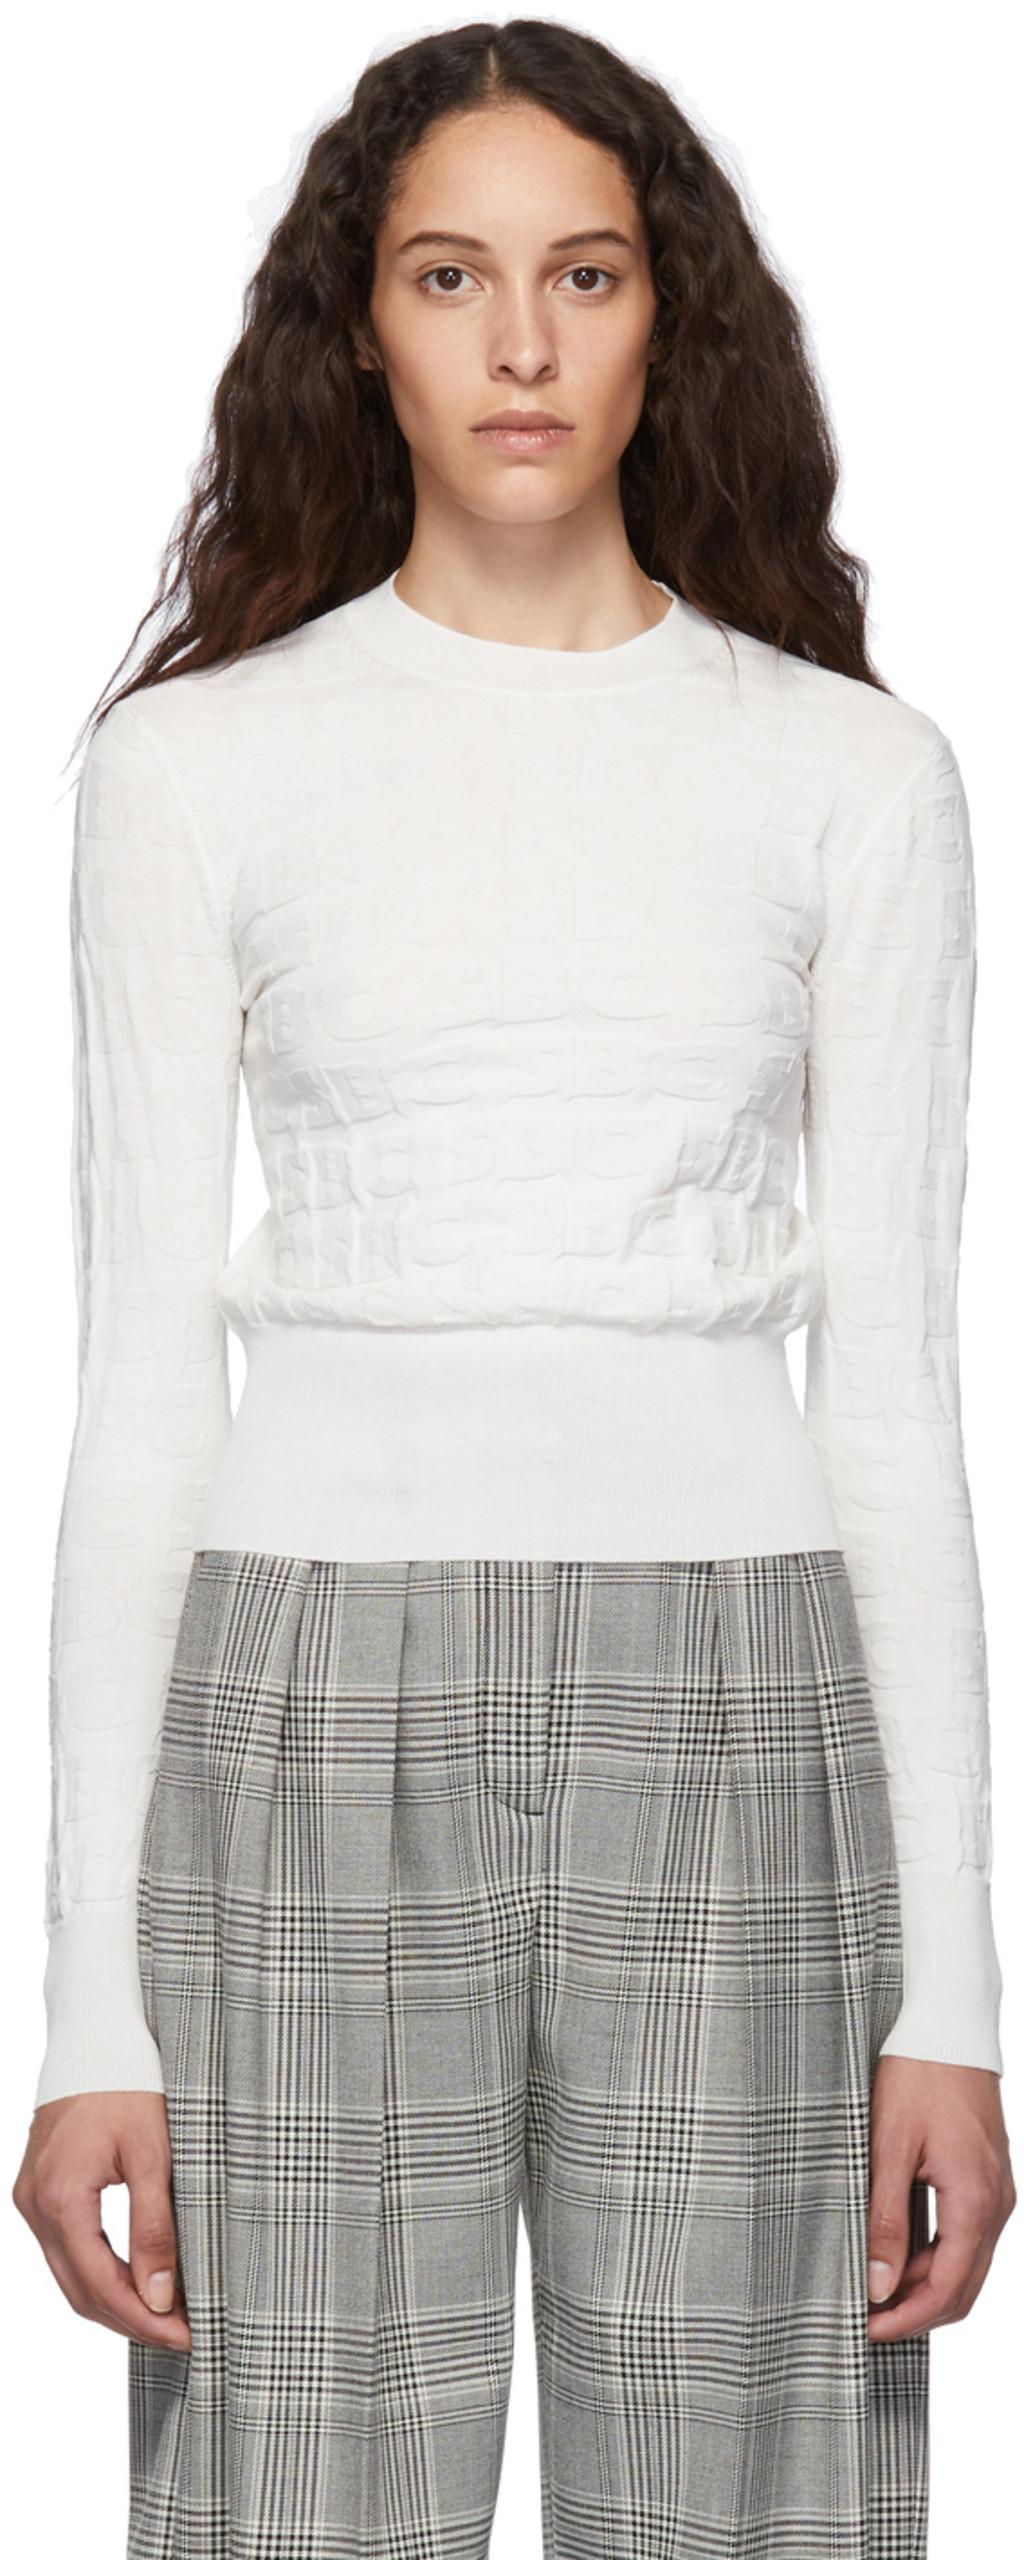 cc691879e9 White SBC Crewneck Sweater